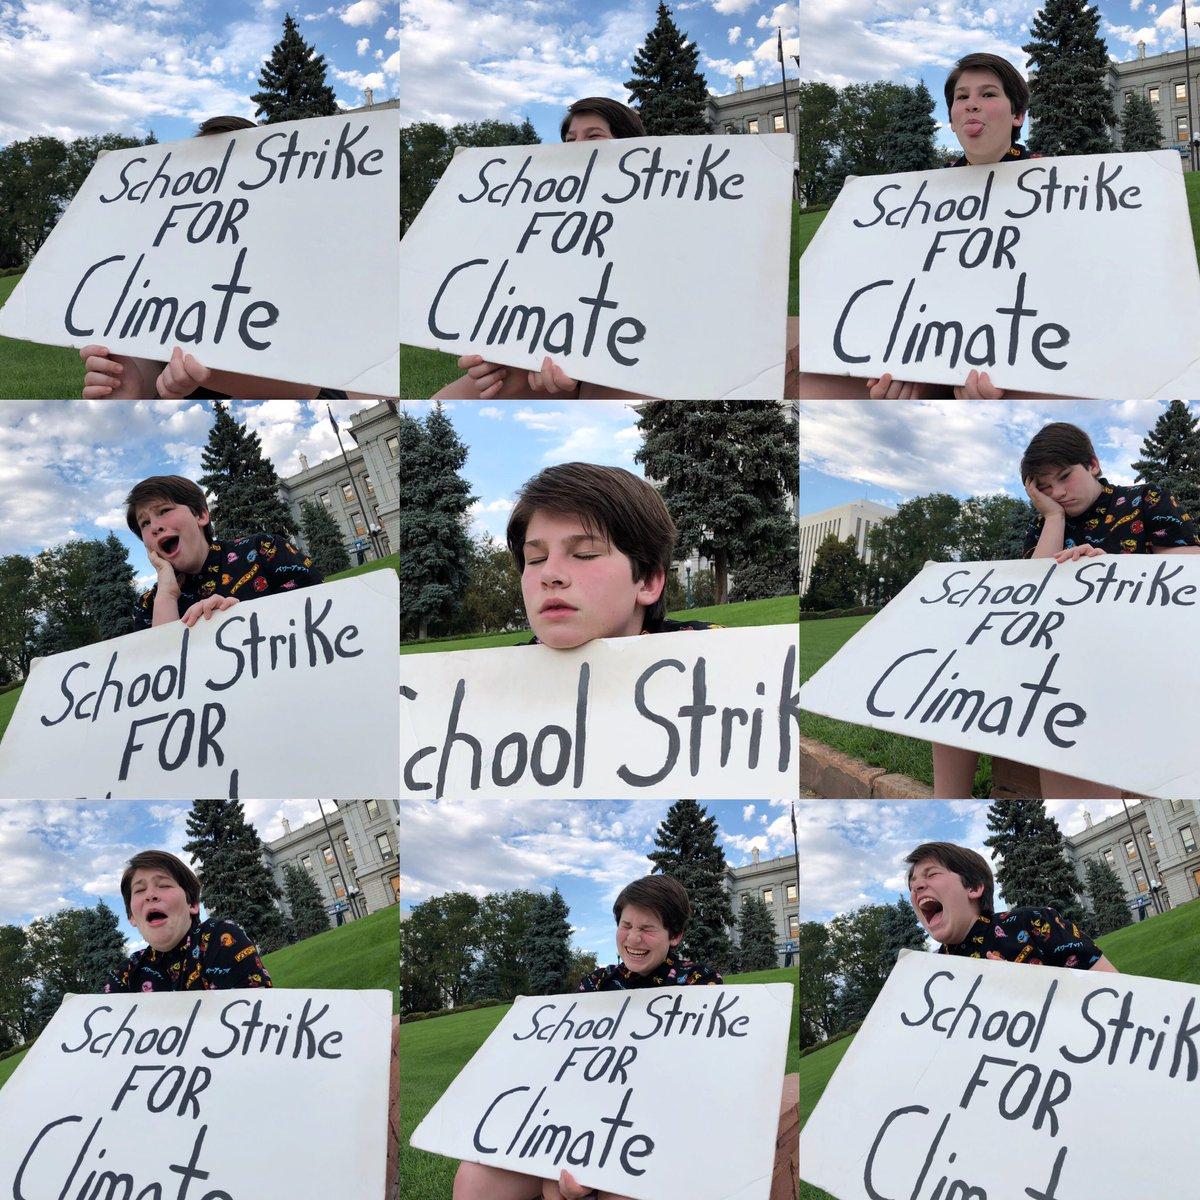 I fell asleep at my #ClimateStrike today!    #FridaysForFuture @FFF_USA @Fridays4future @GretaThunberg<br>http://pic.twitter.com/k1s3d73FEn